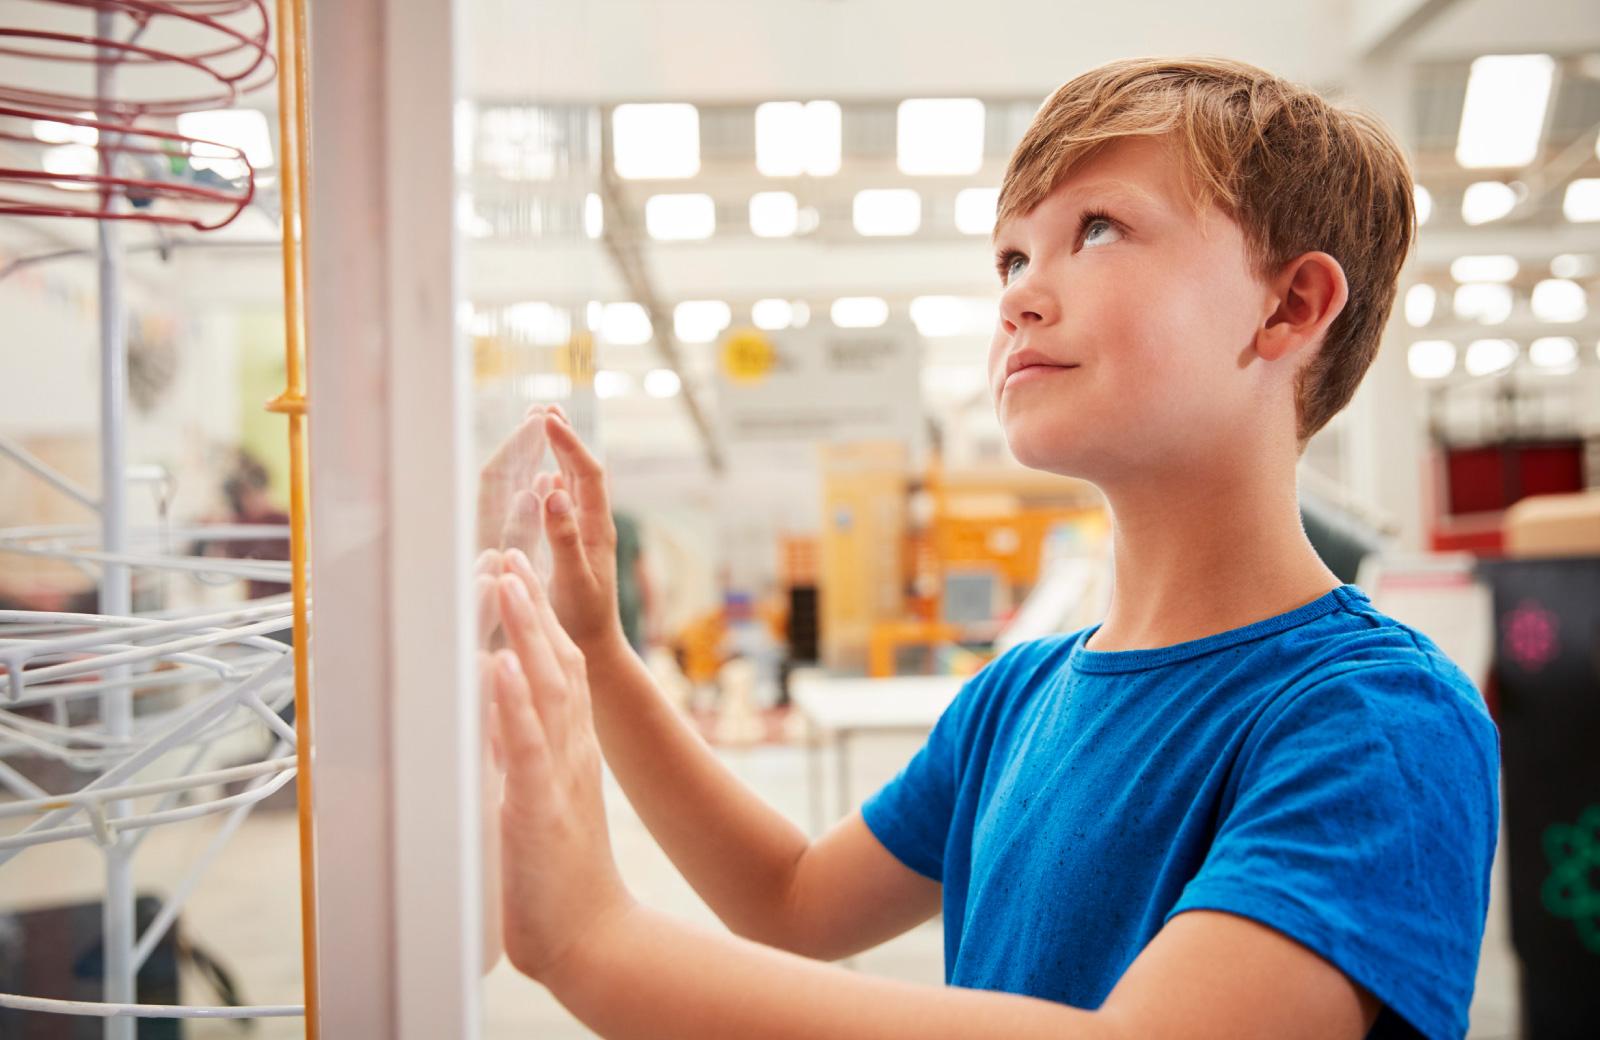 boy checking out an artwork